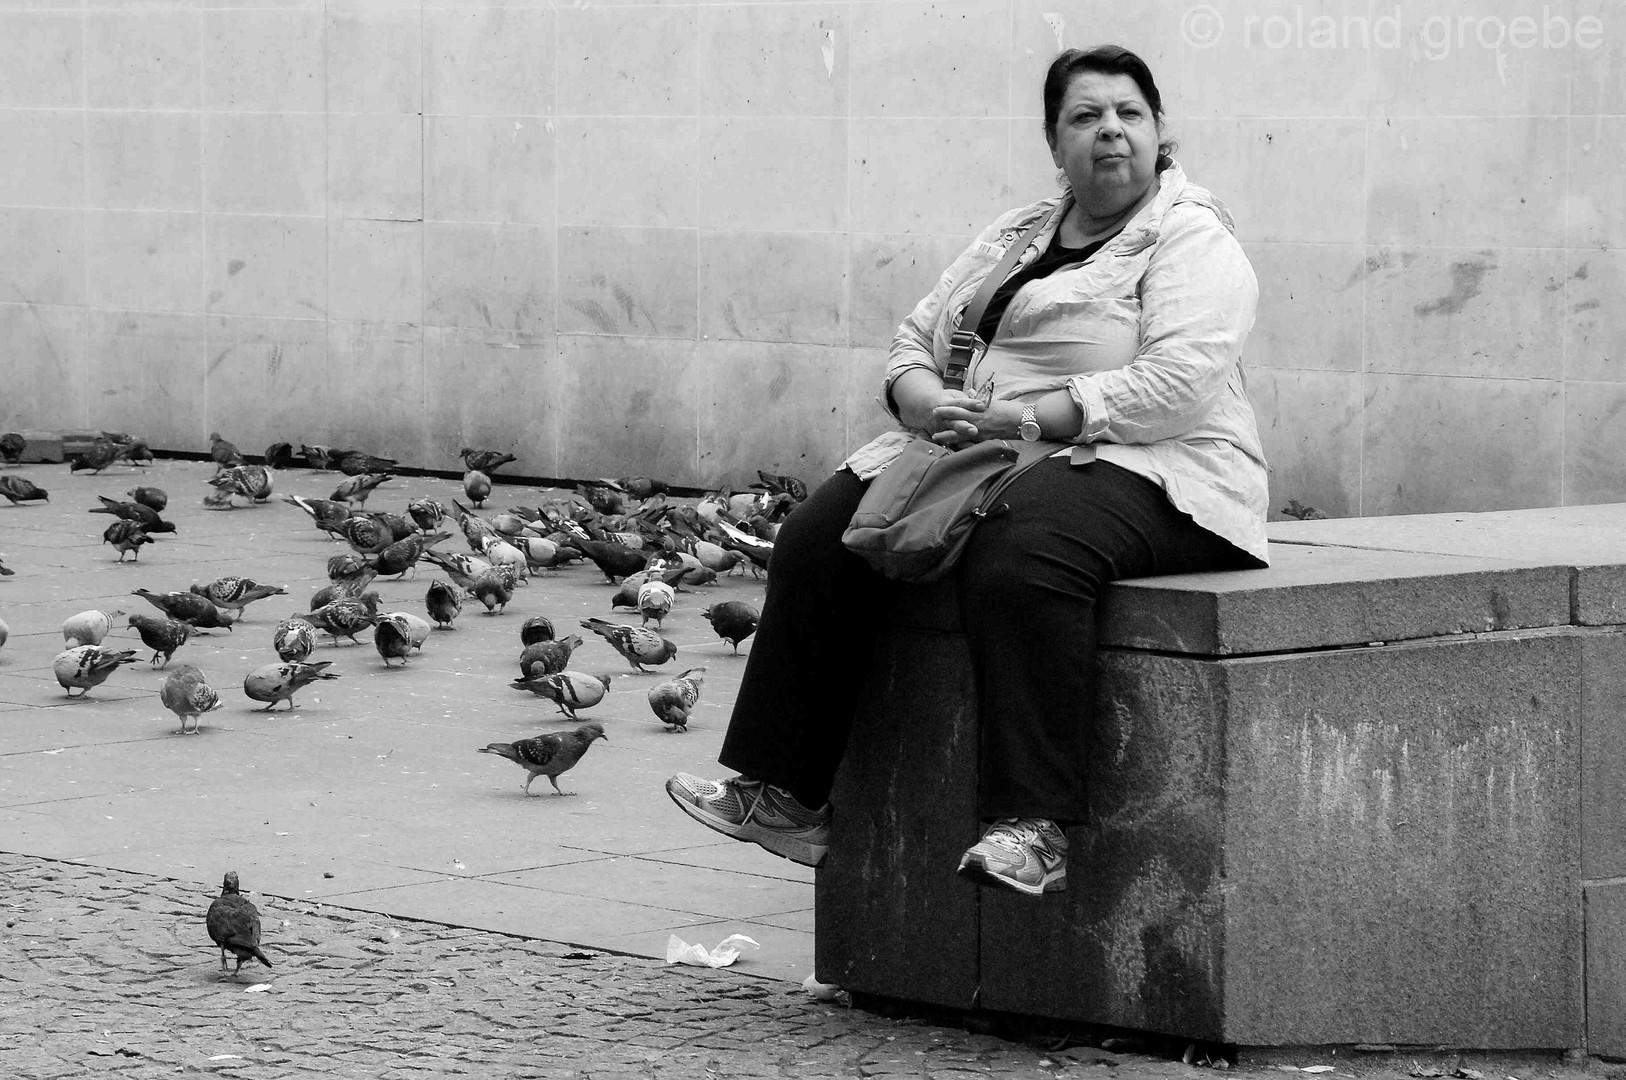 pigeon watching